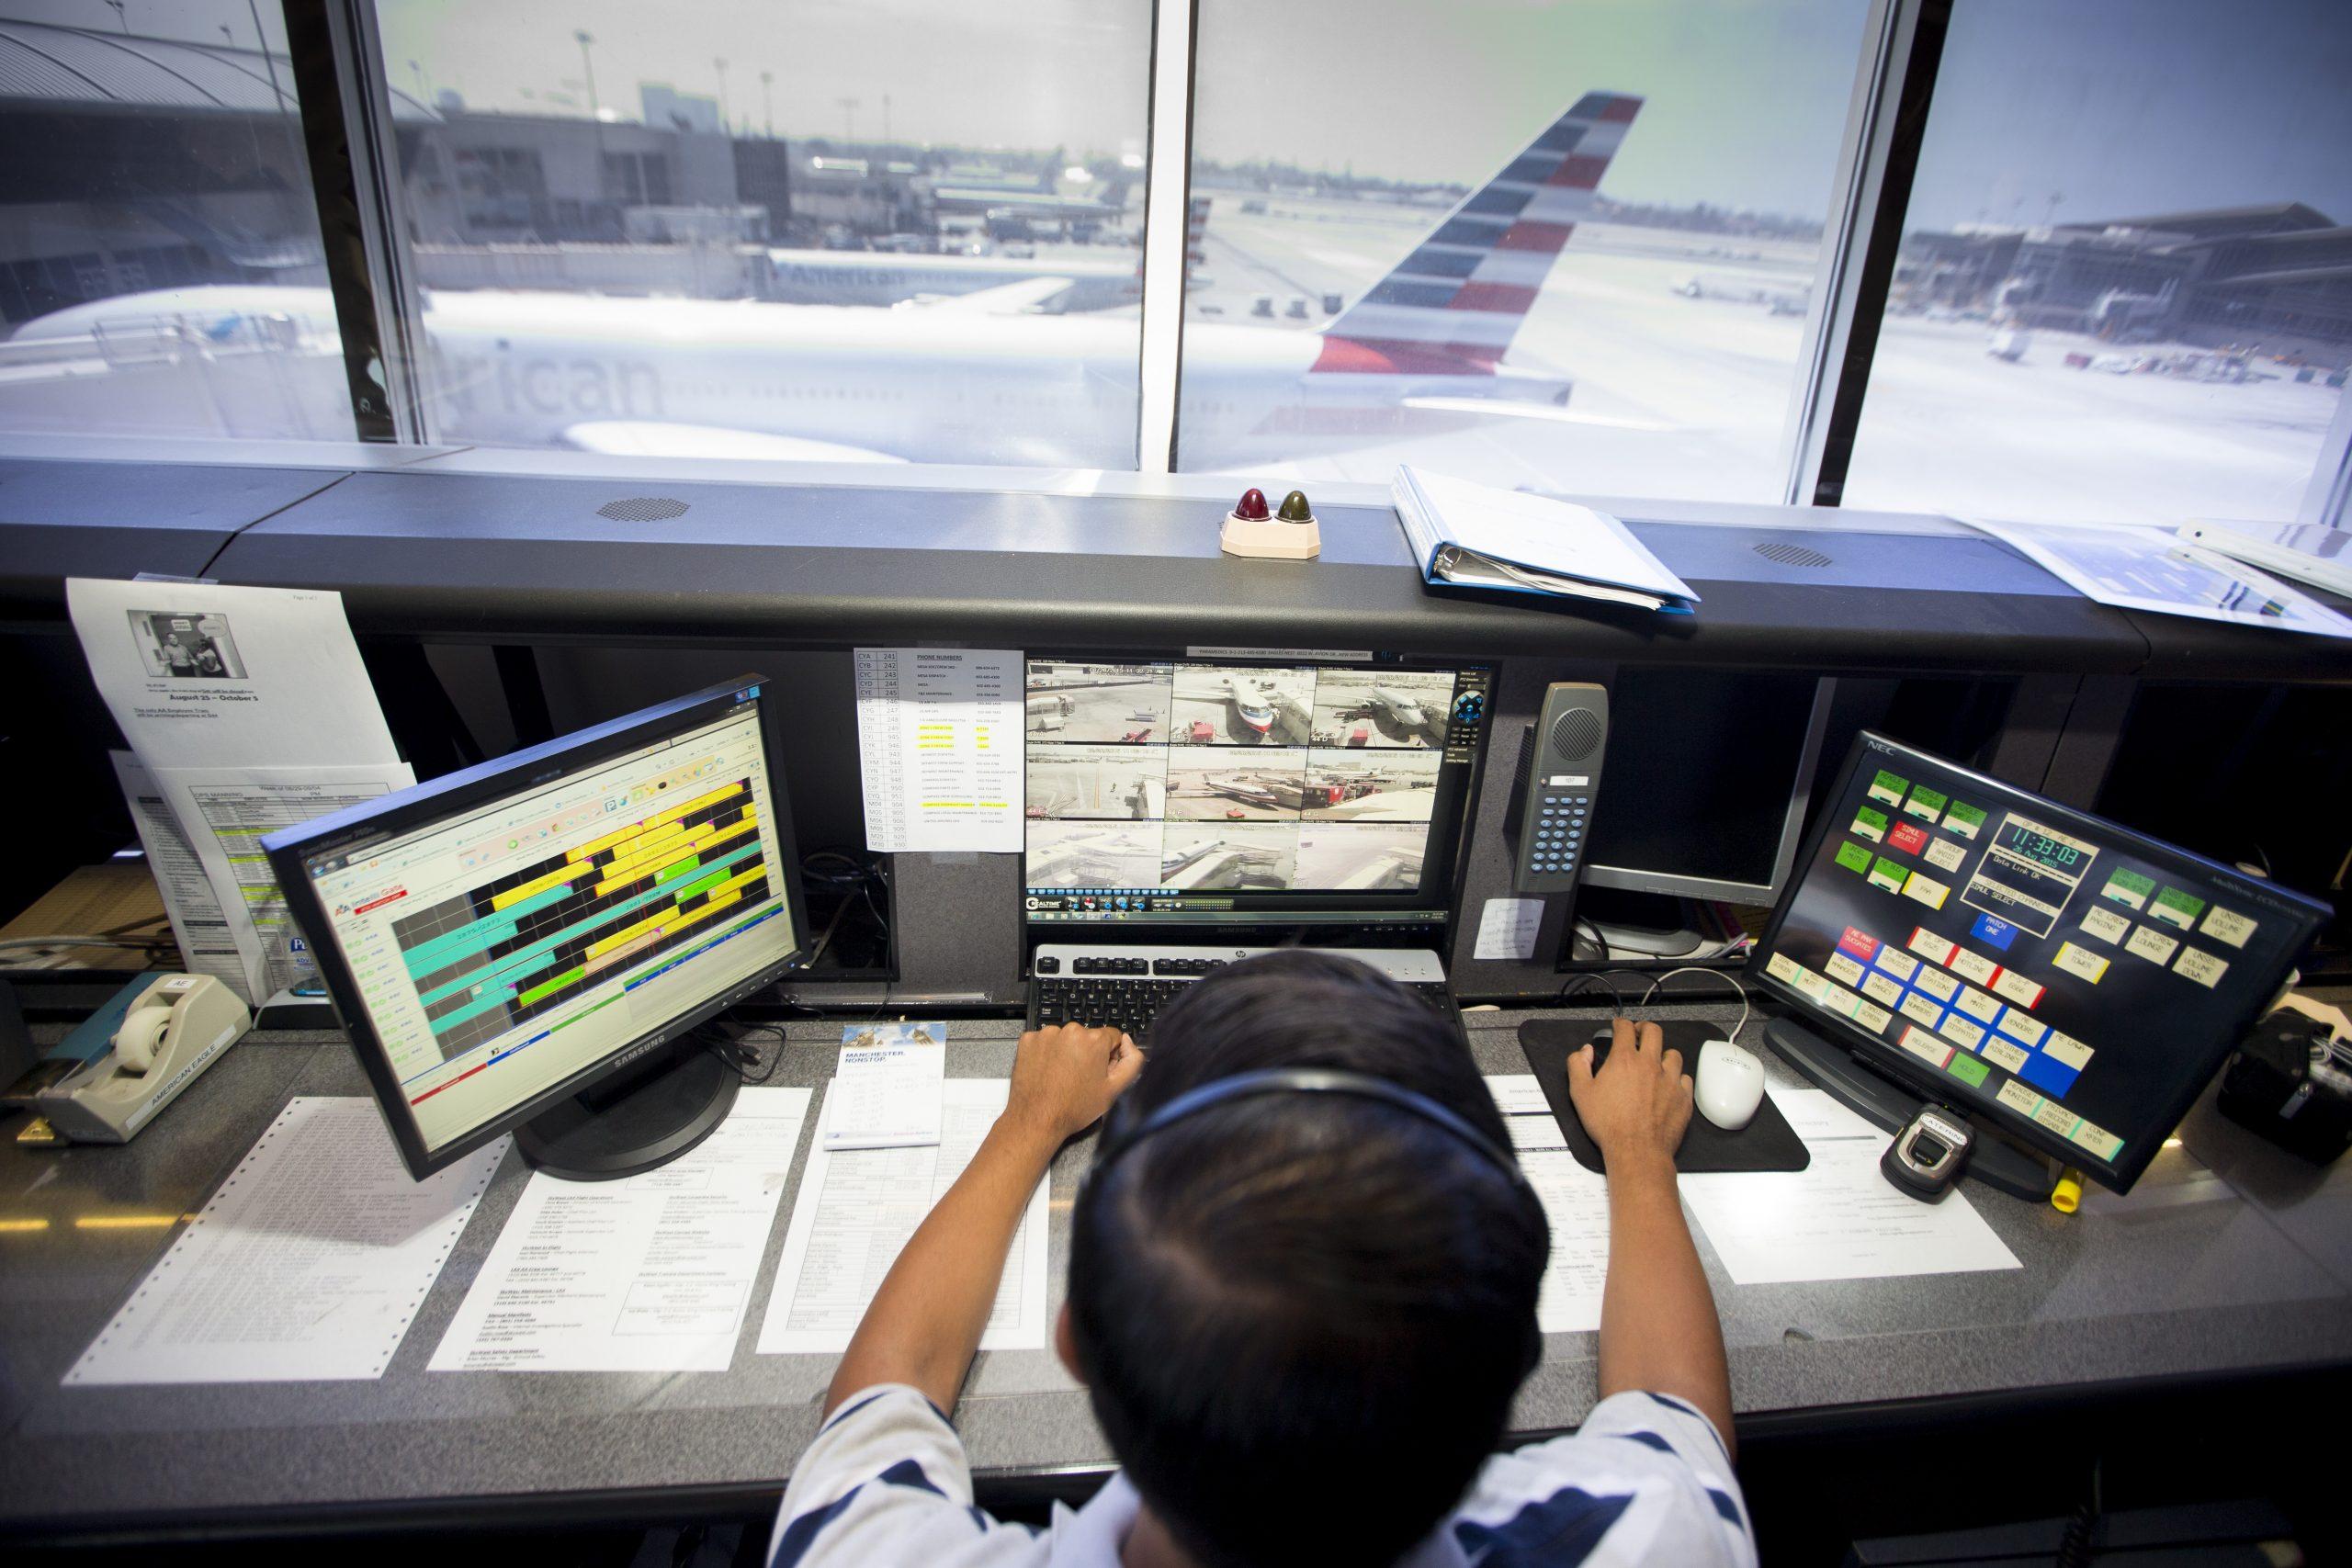 Verdens største flyselskab, American Airlines, øger fra august sin betjening mellem USA og Europa. AA har ingen ruter til Skandinavien. Pressefoto: American Airlines, Brandon Wade.